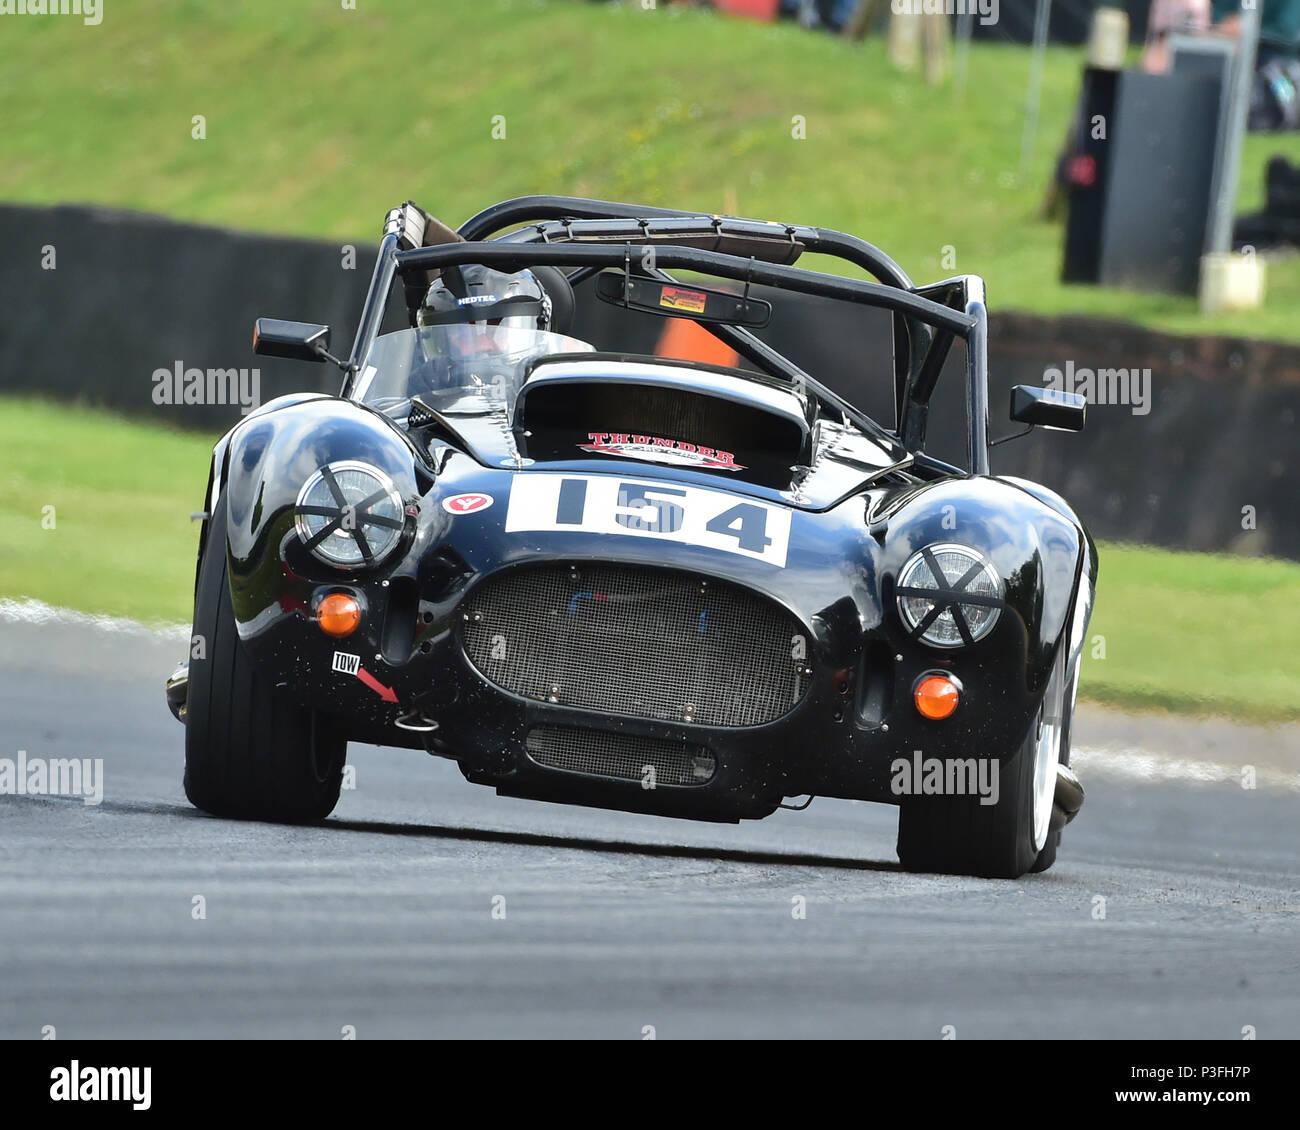 Robert Frost Dax Tojiero Bernie S V8s Us Muscle Cars American